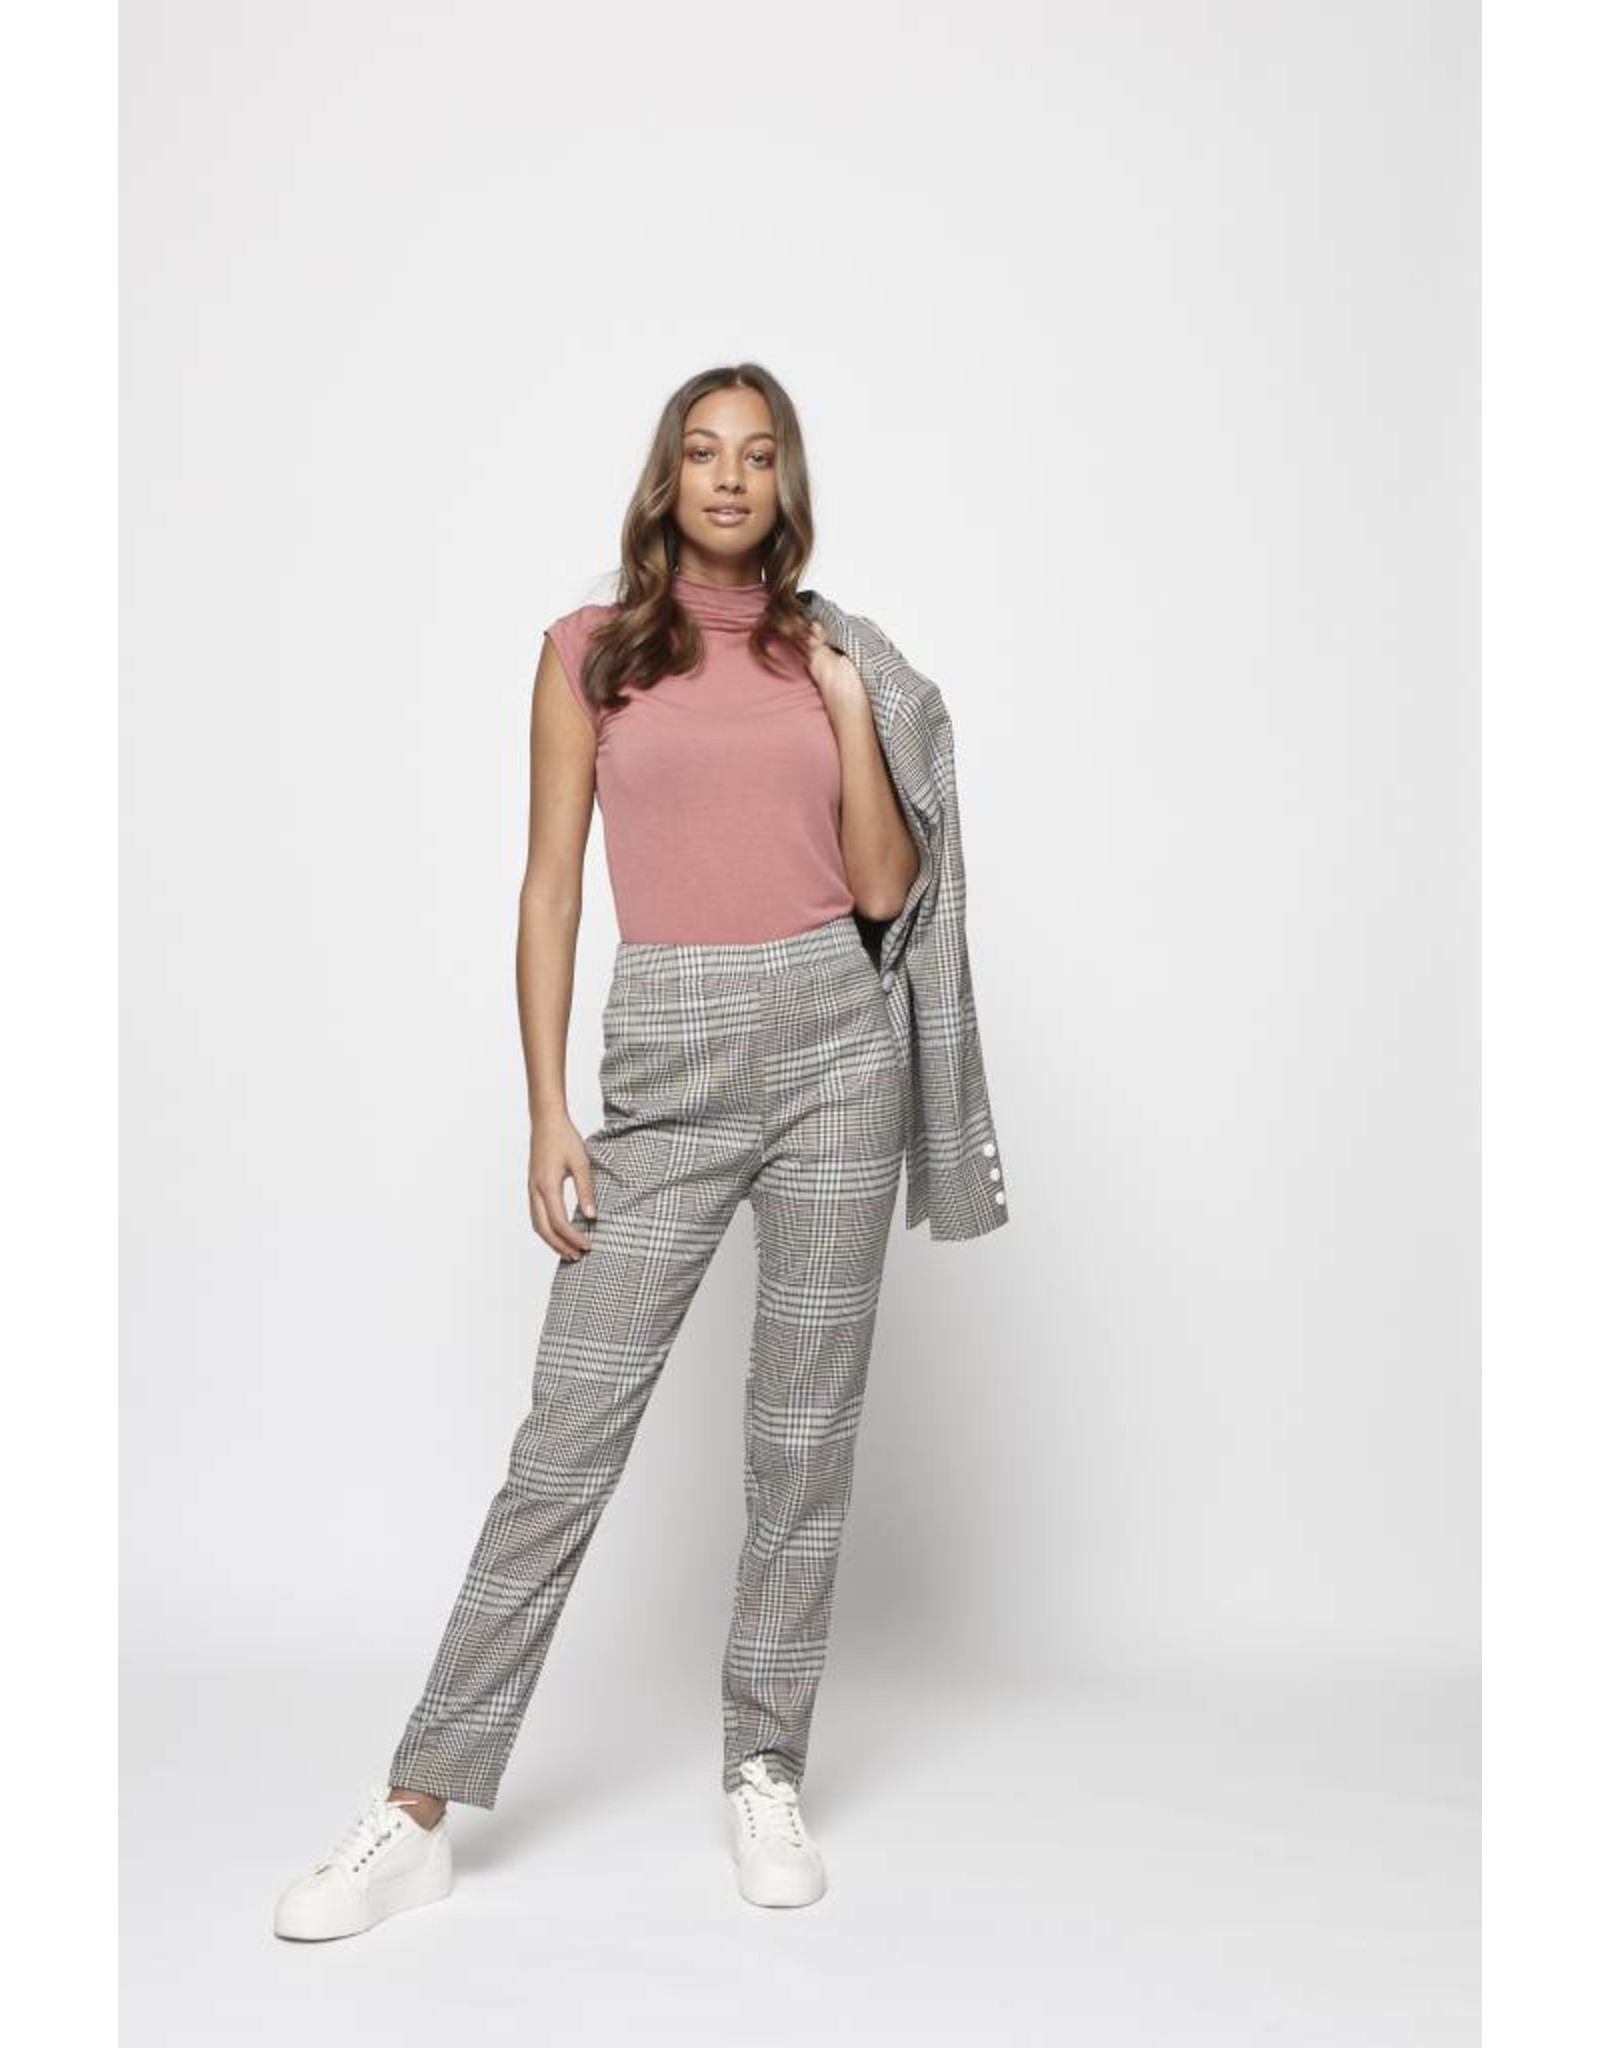 Lofty Manner Trouser Nickie Pink